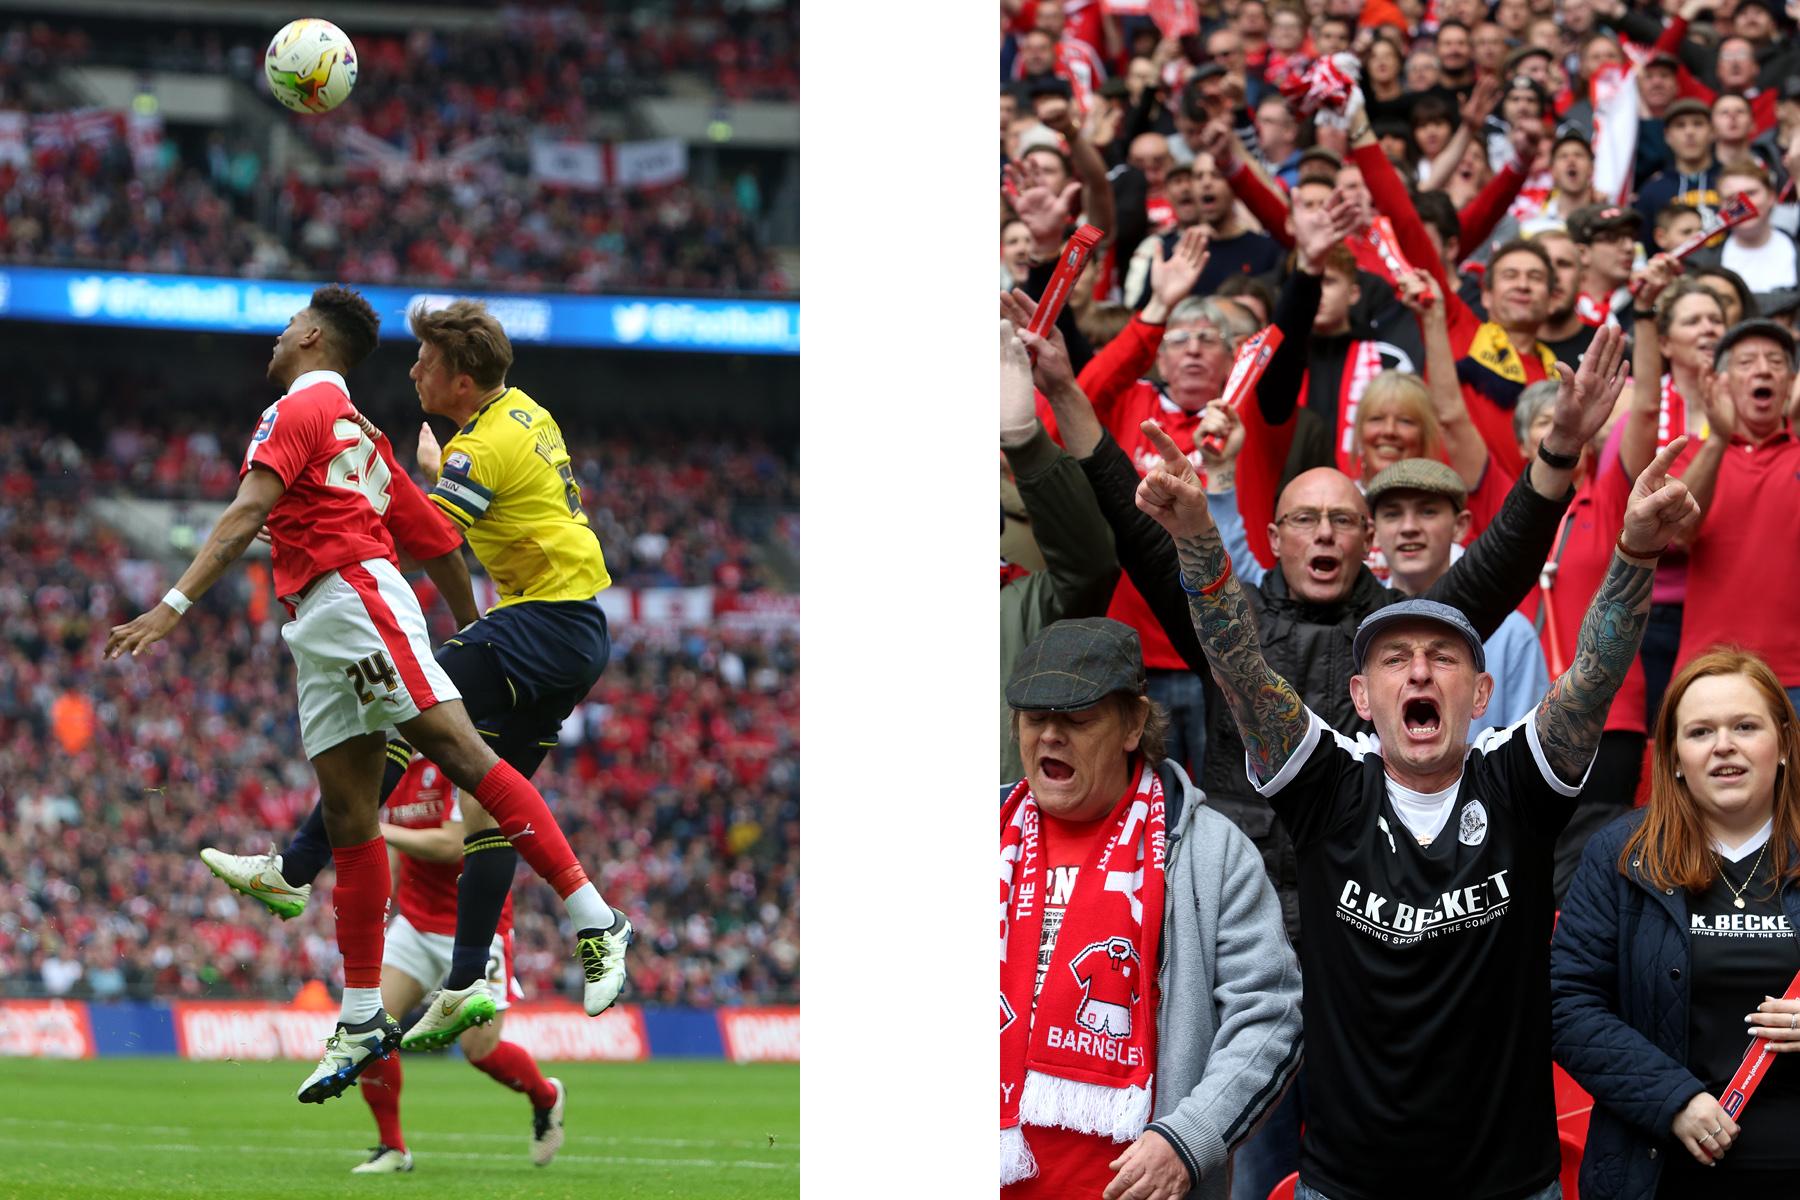 PR_Wembley24.jpg